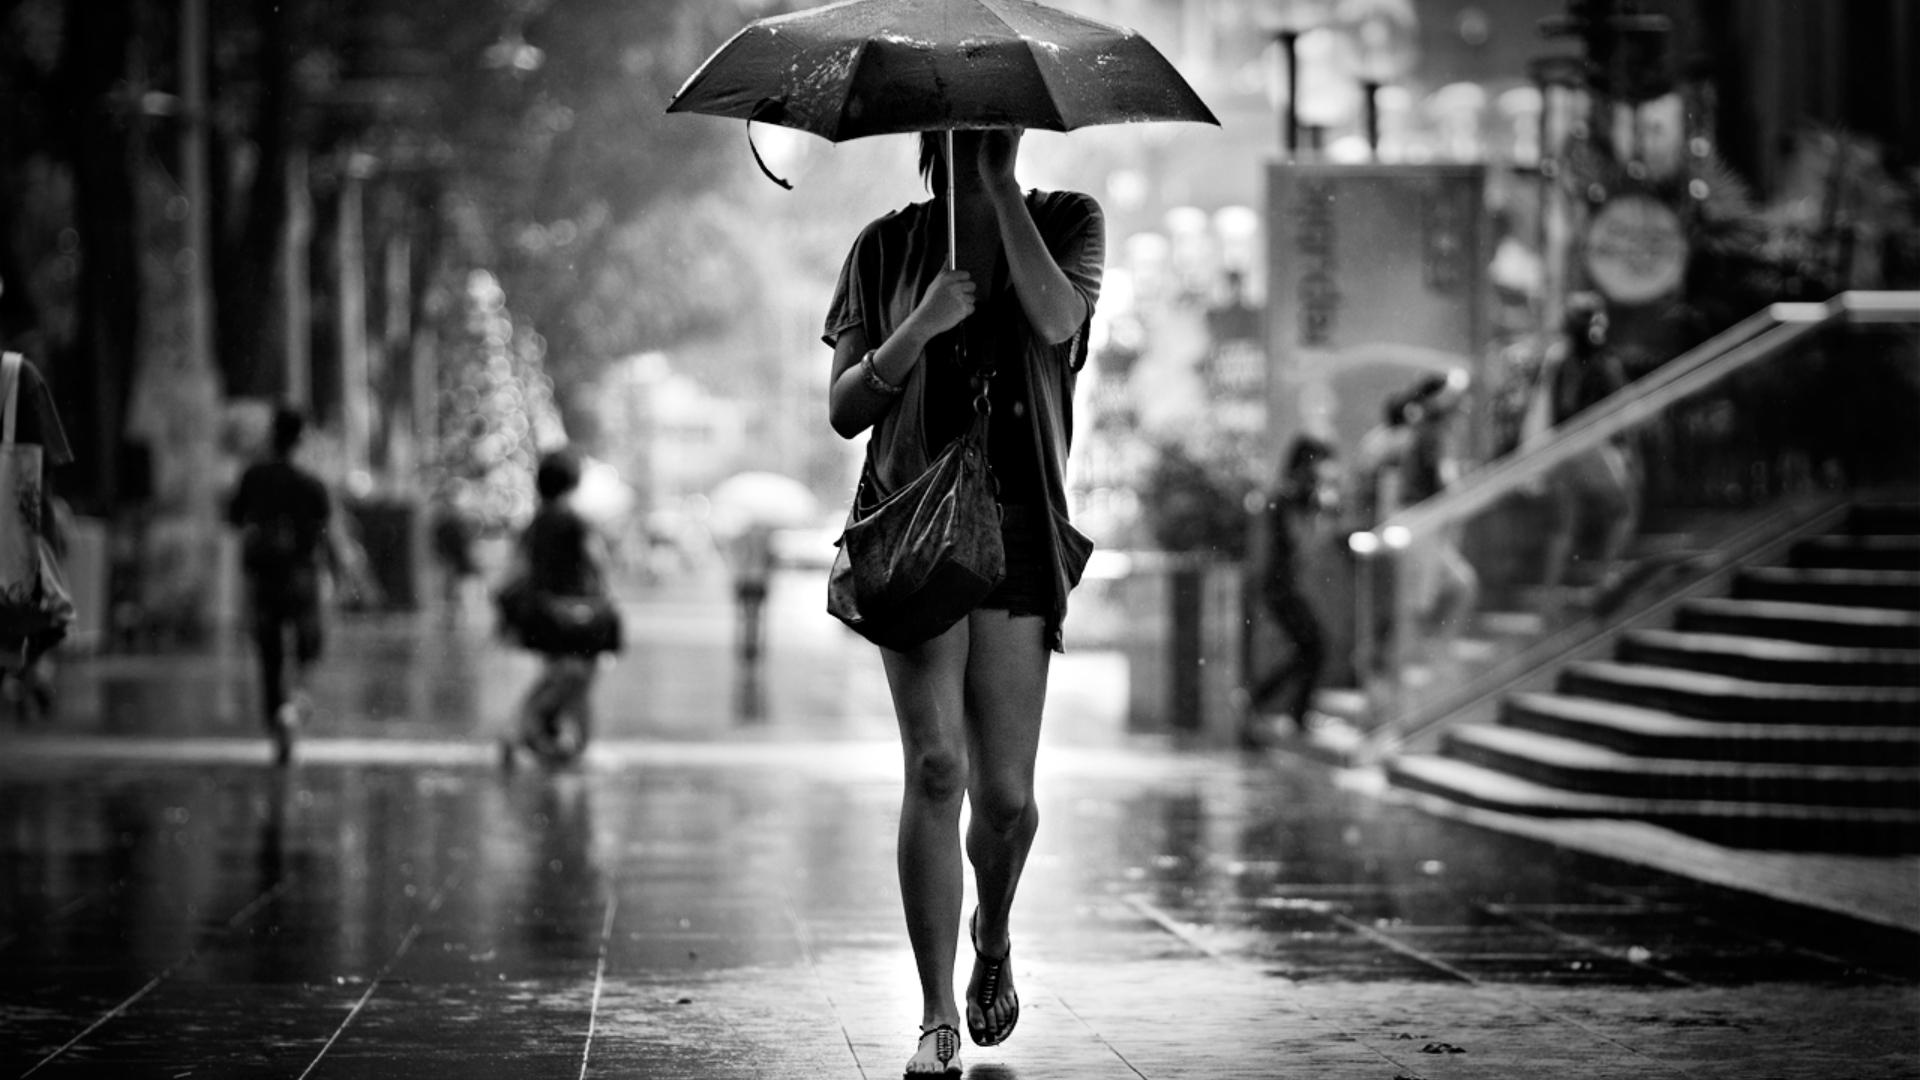 woman-umbrella-rain-street